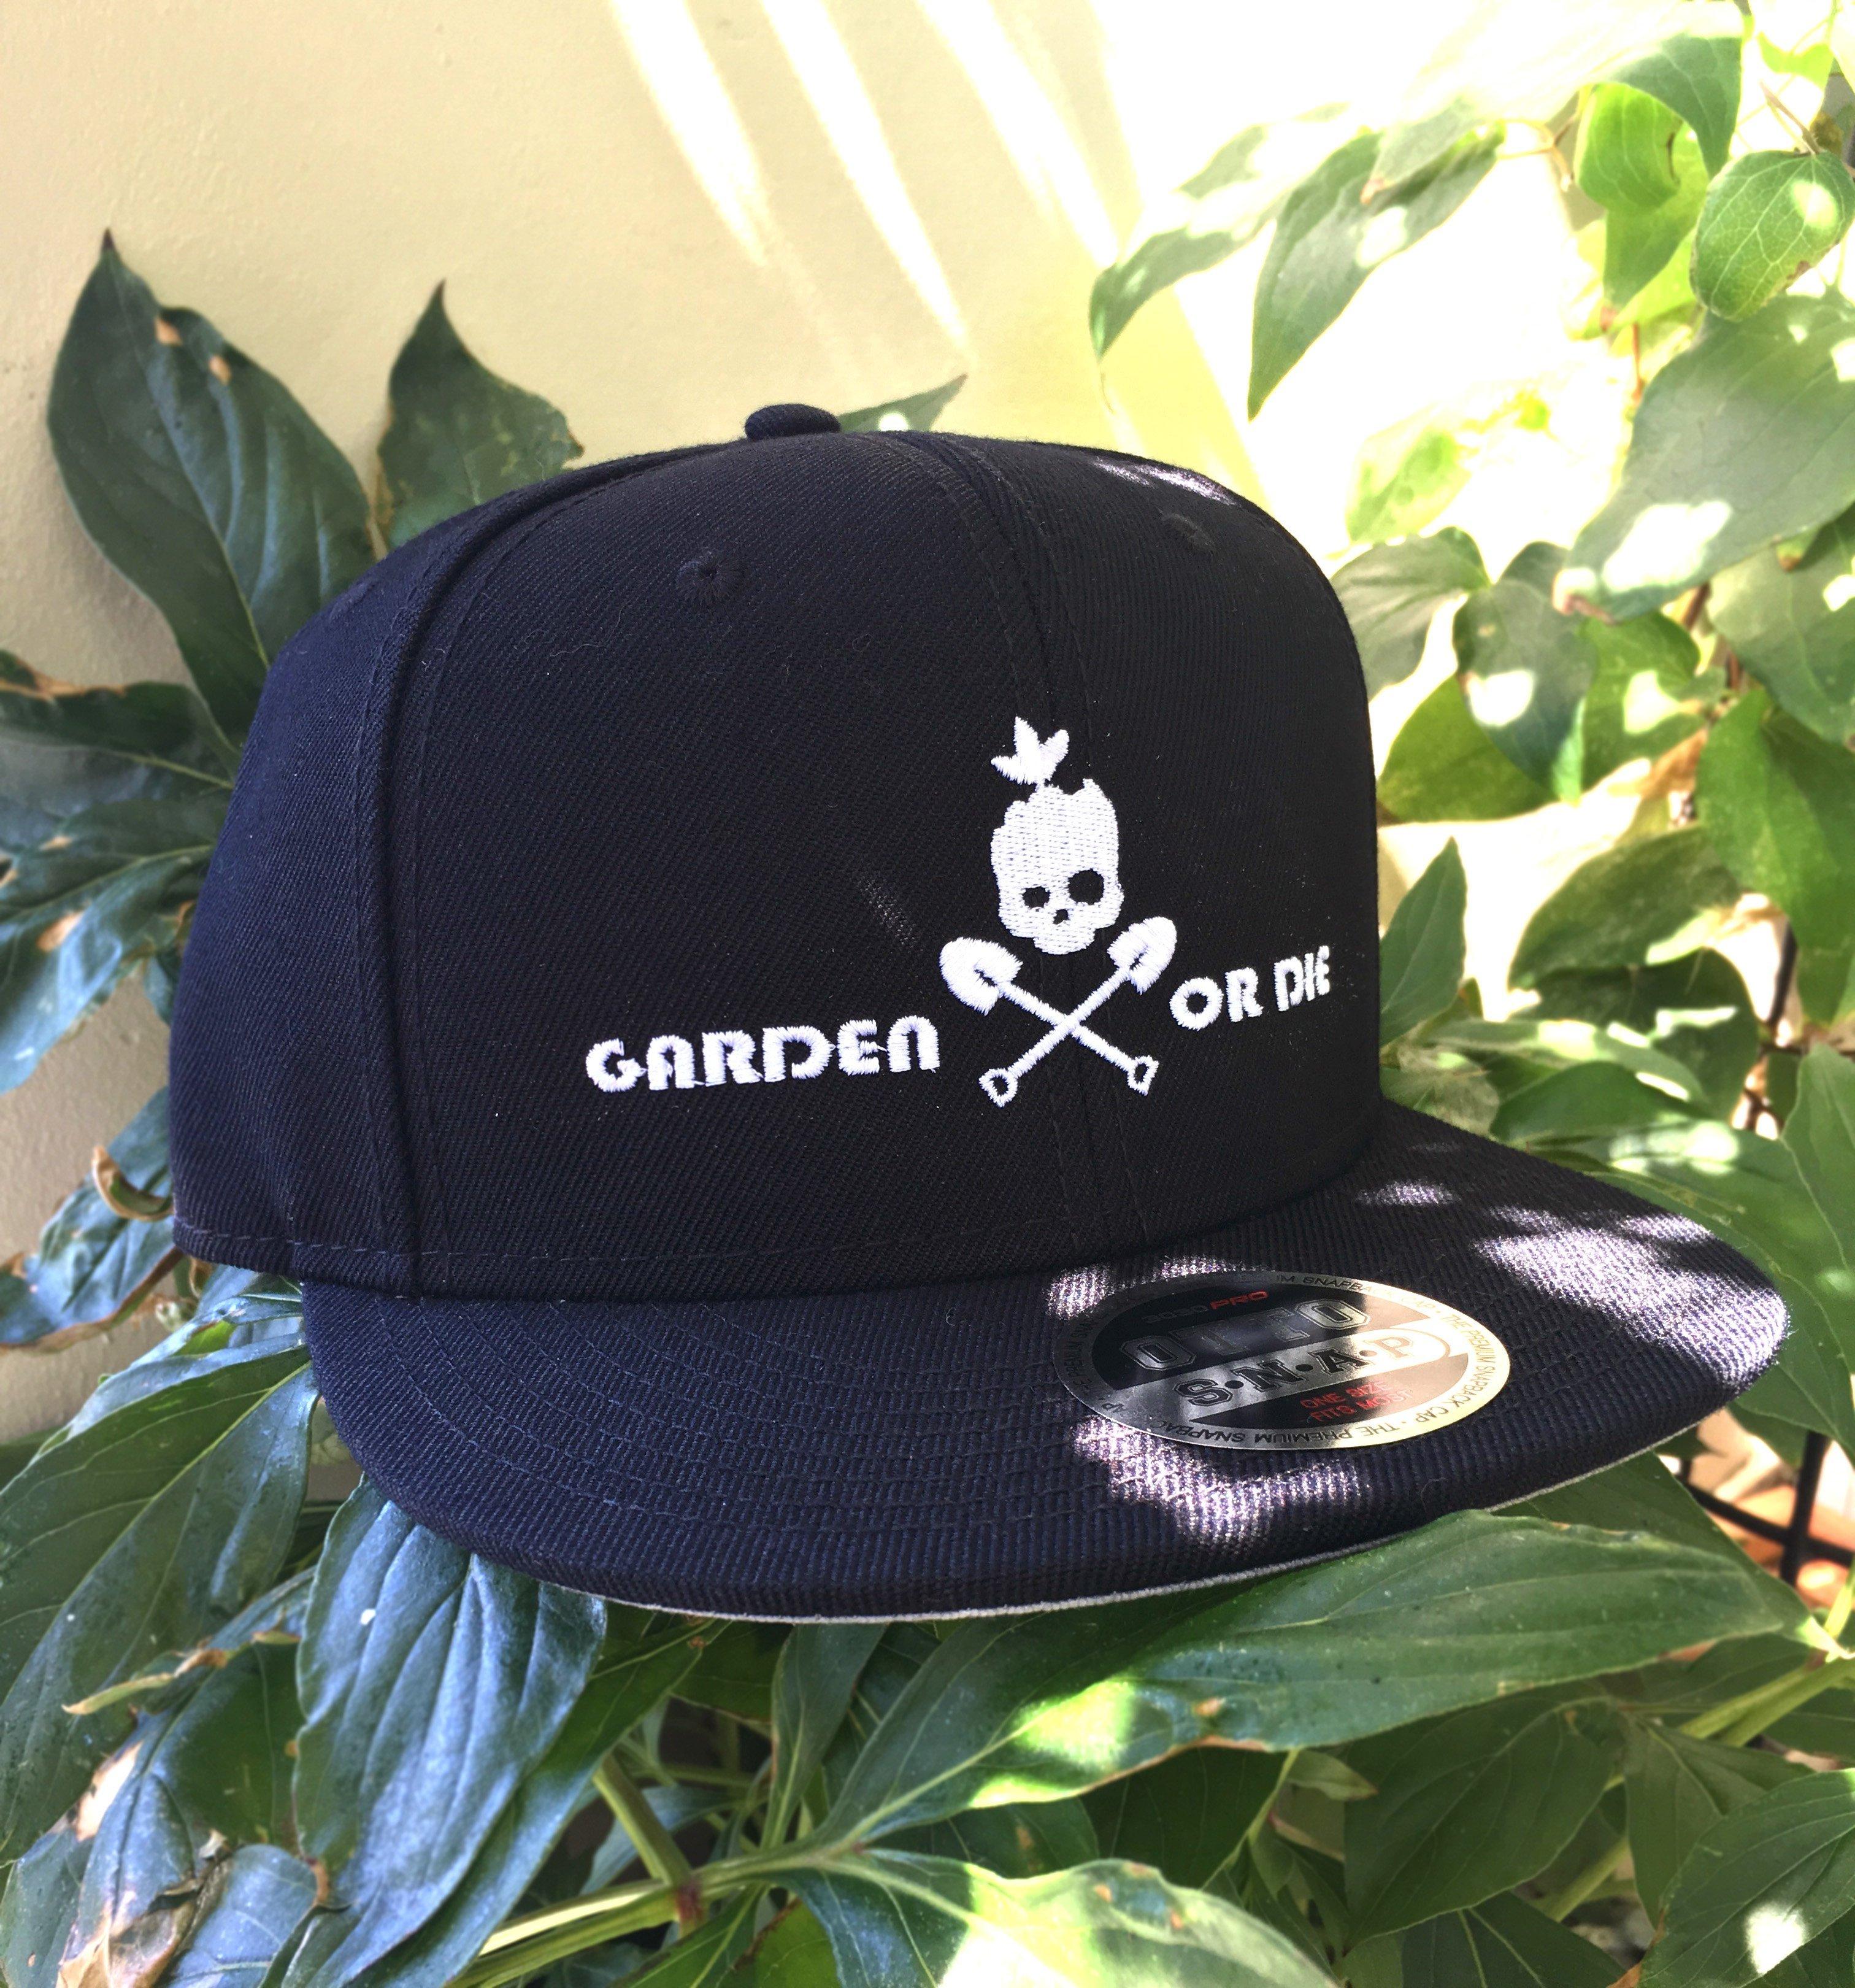 garden-or-die-cap